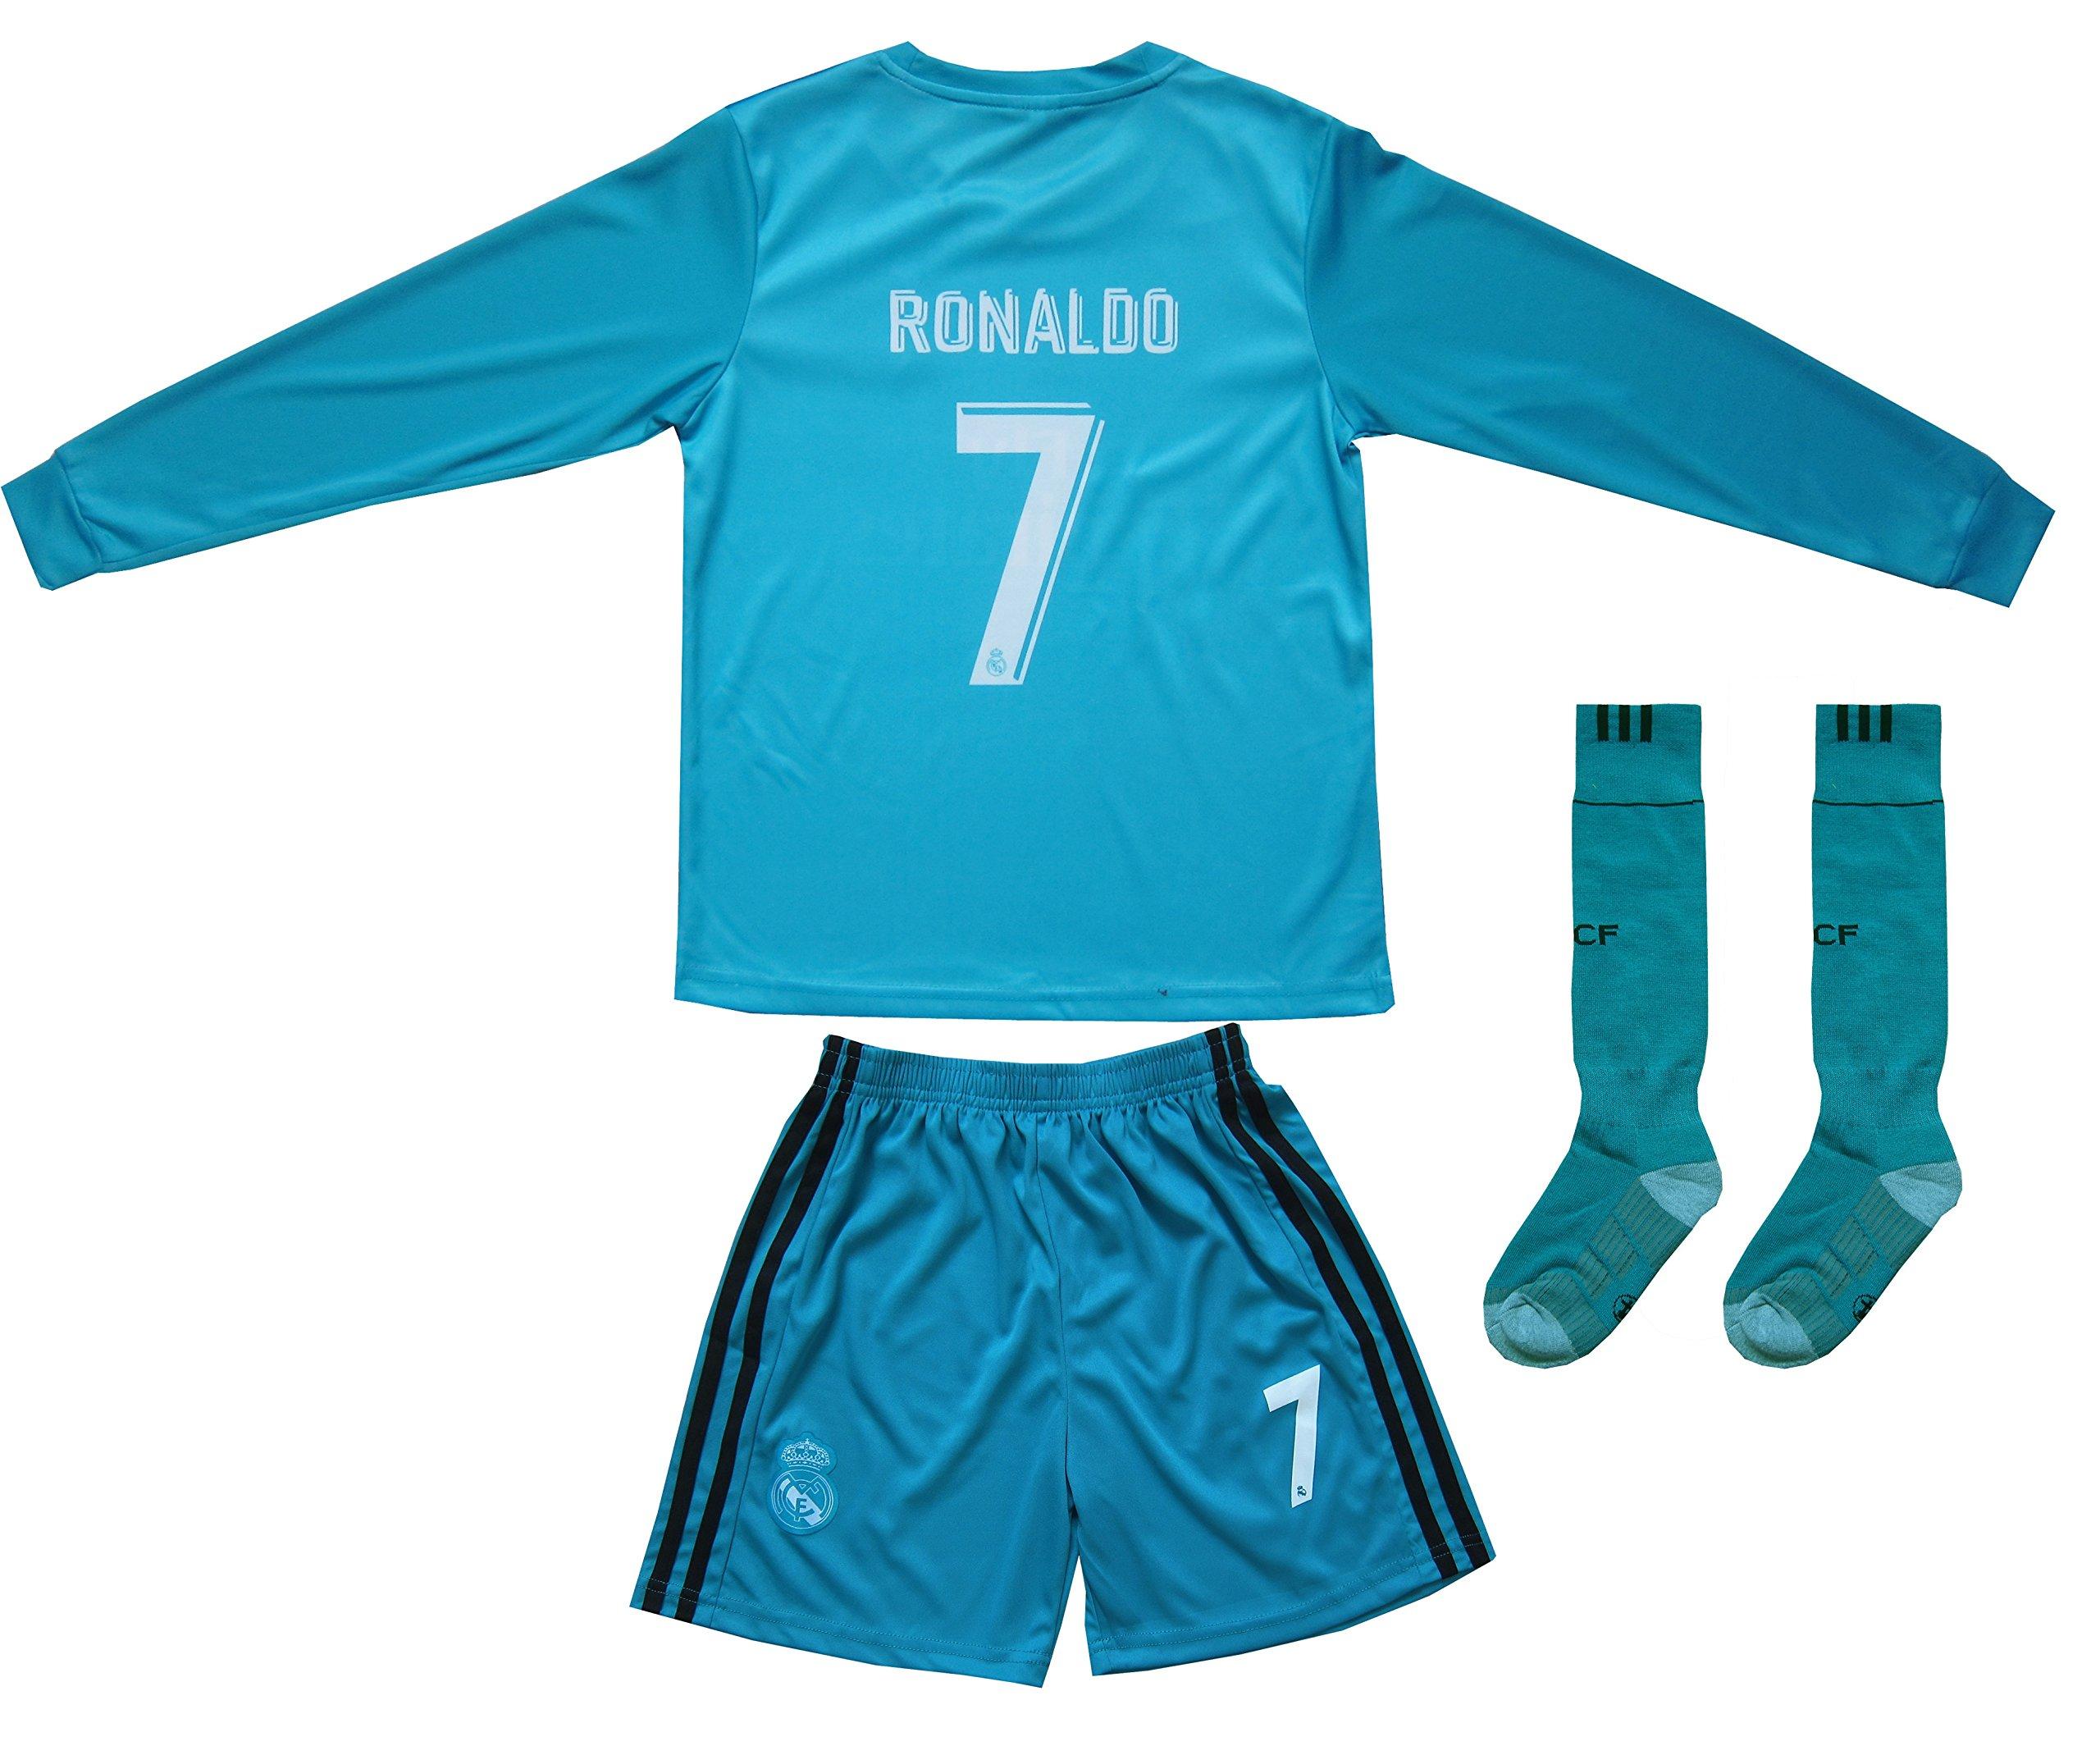 Real Madrid Ronaldo Childrens Jersey and Shorts Set